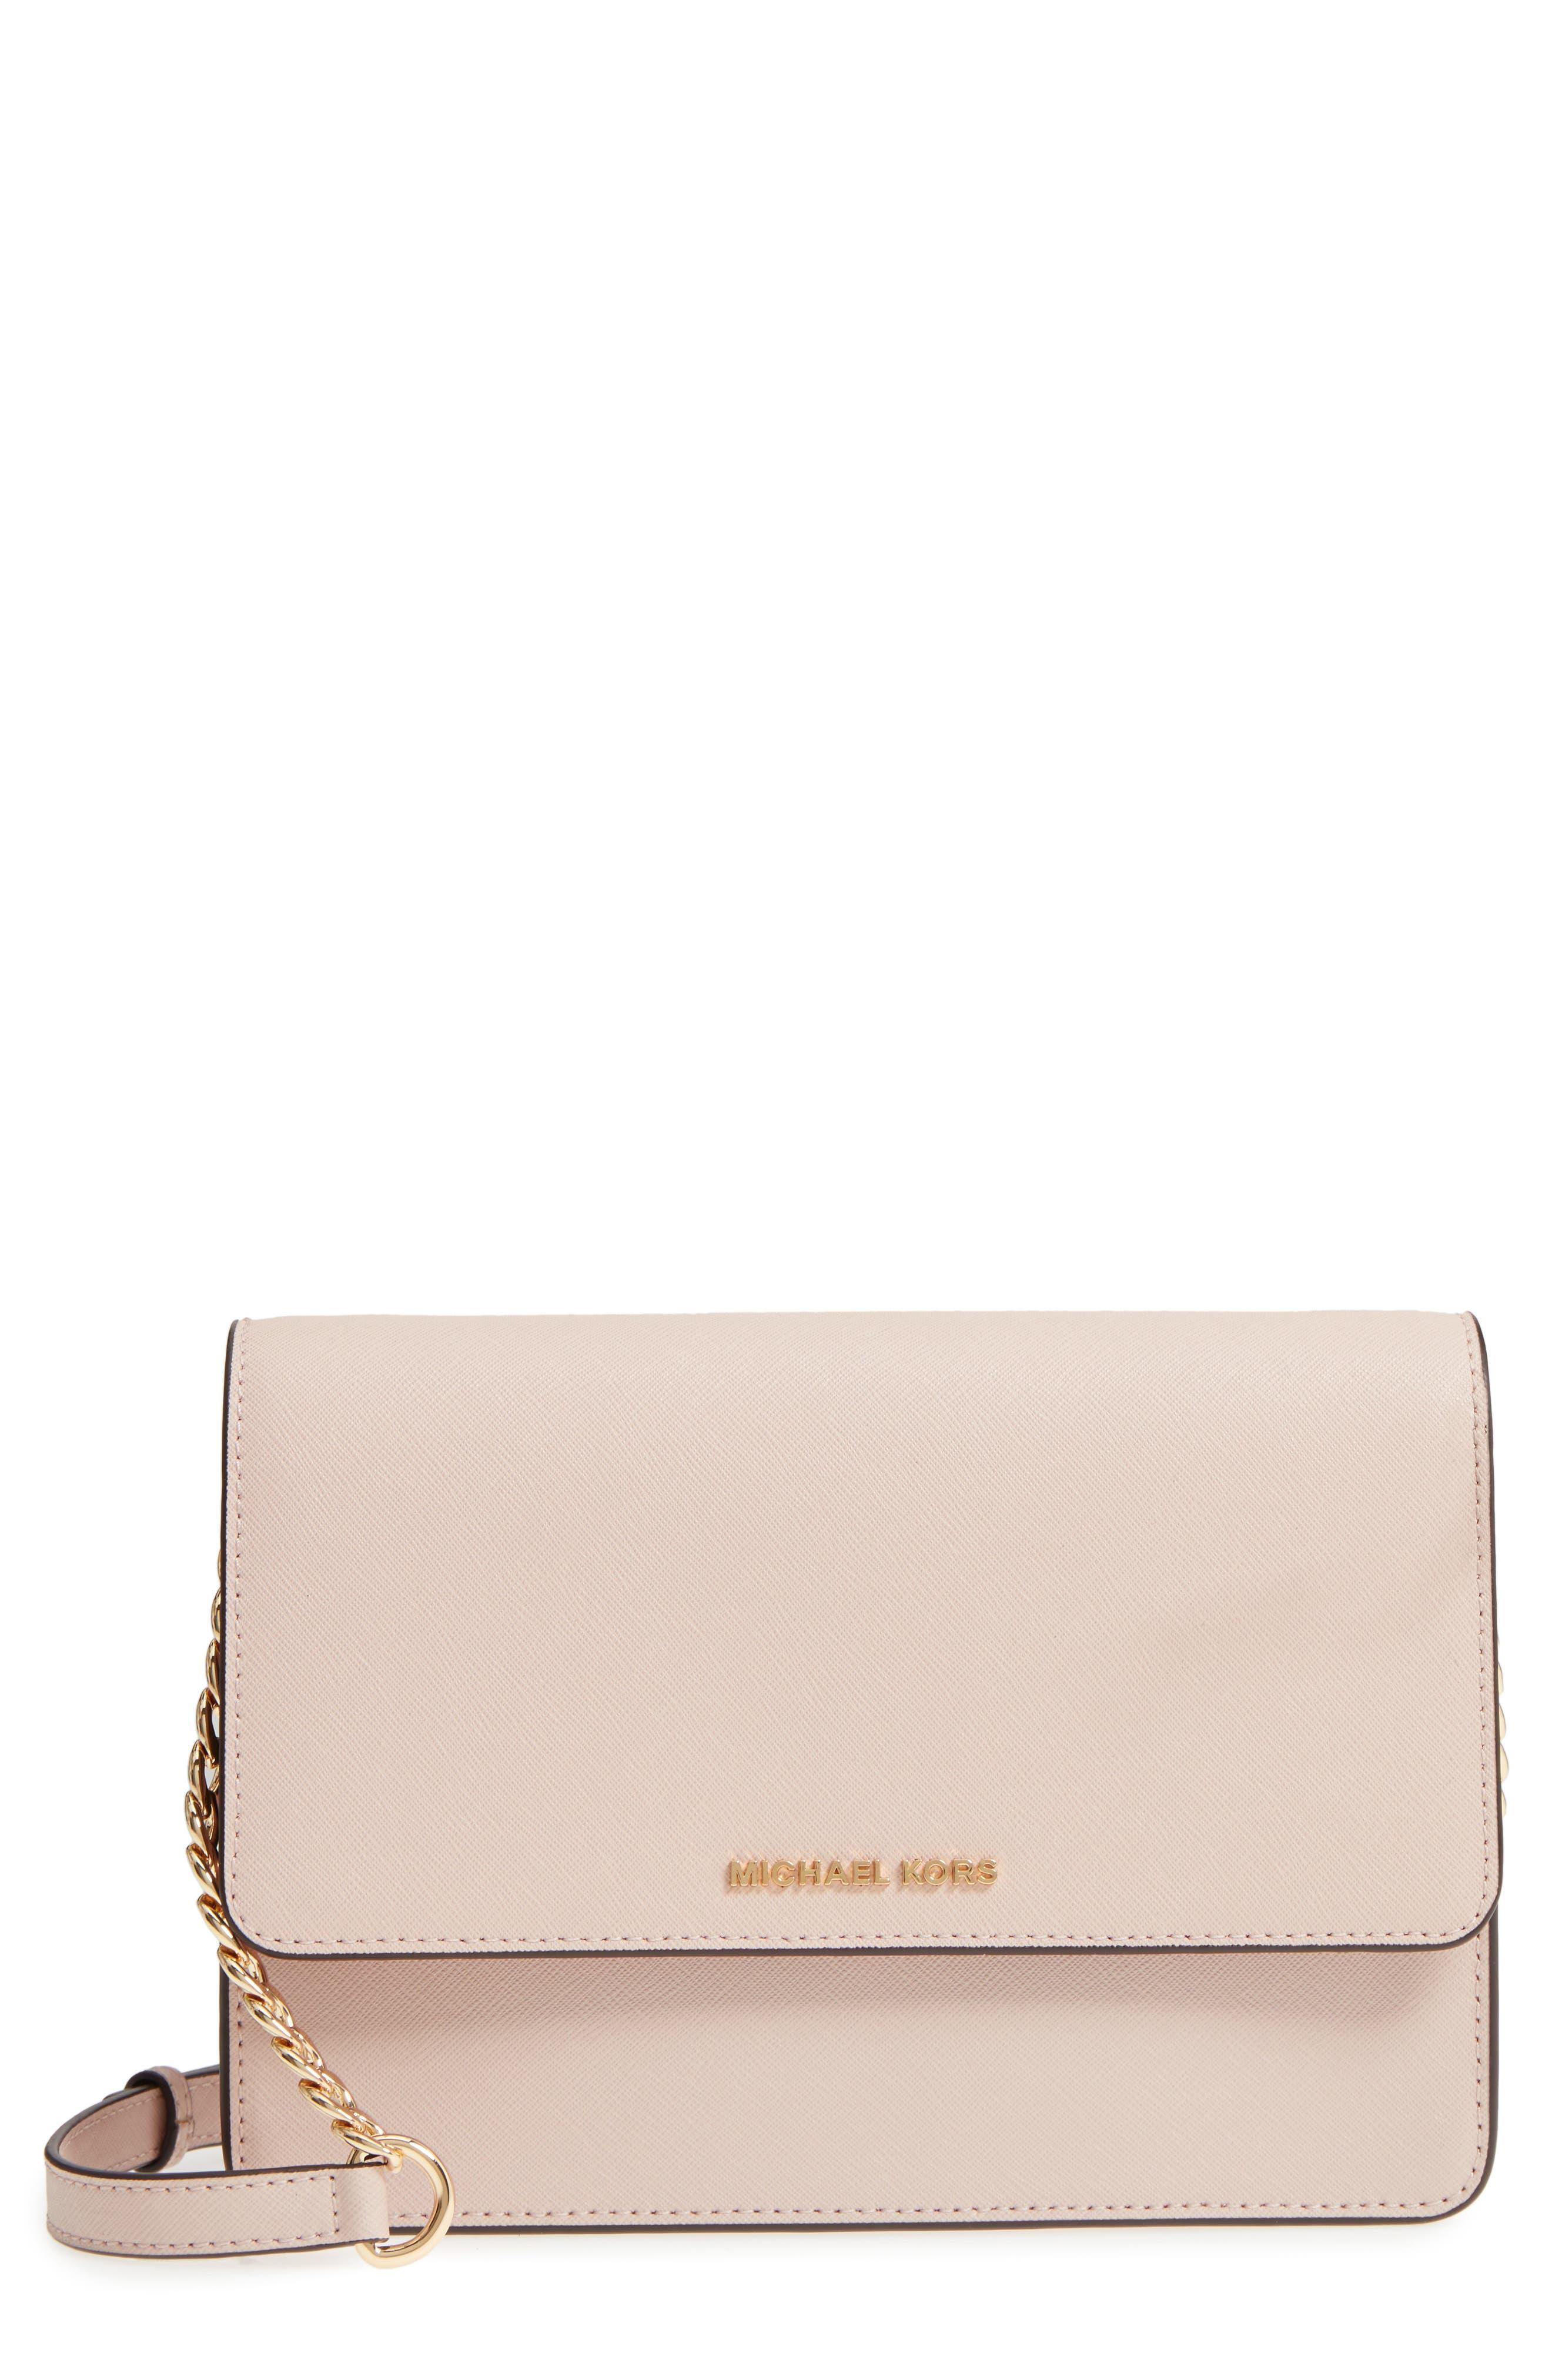 Large Daniela Leather Crossbody Bag,                         Main,                         color, SOFT PINK